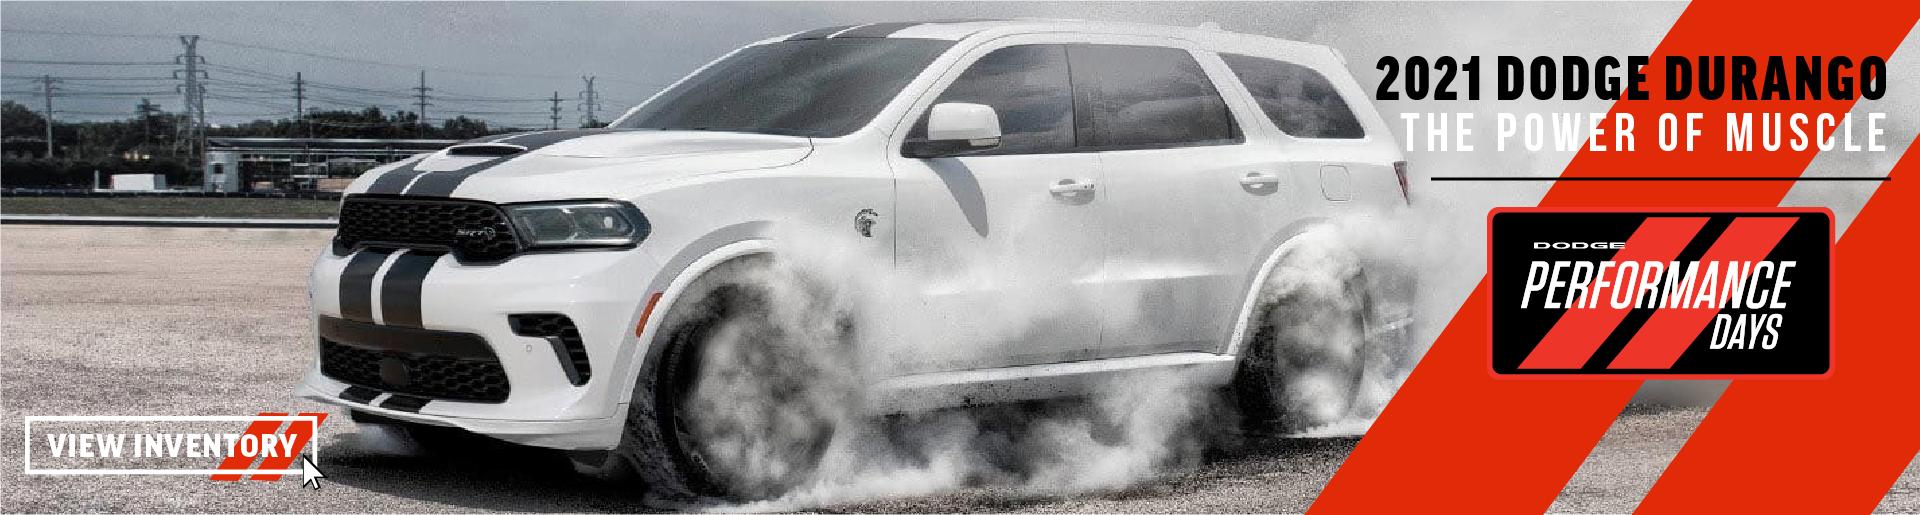 Mar 2021 Dodge Durango Generic